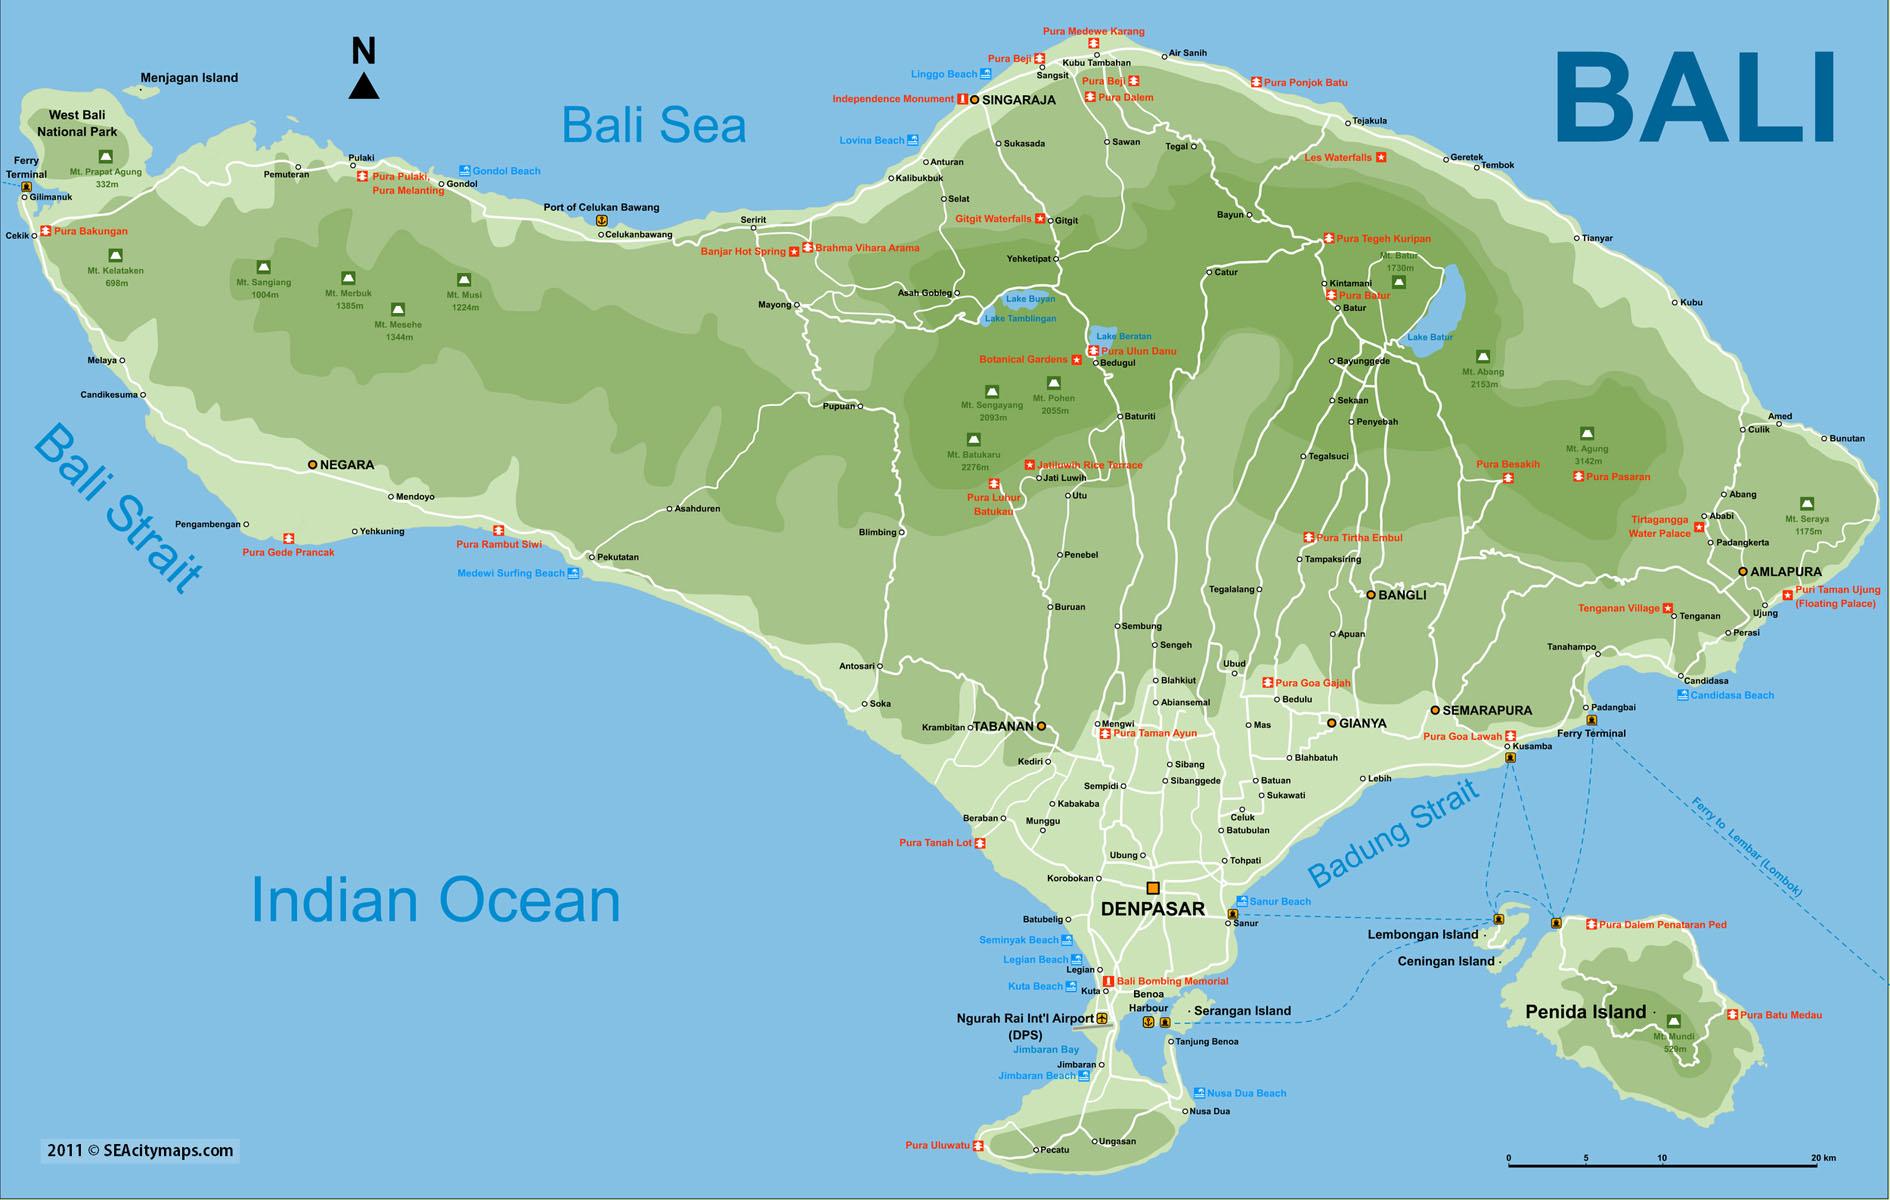 Bali tu villa en bali view in google maps gumiabroncs Choice Image